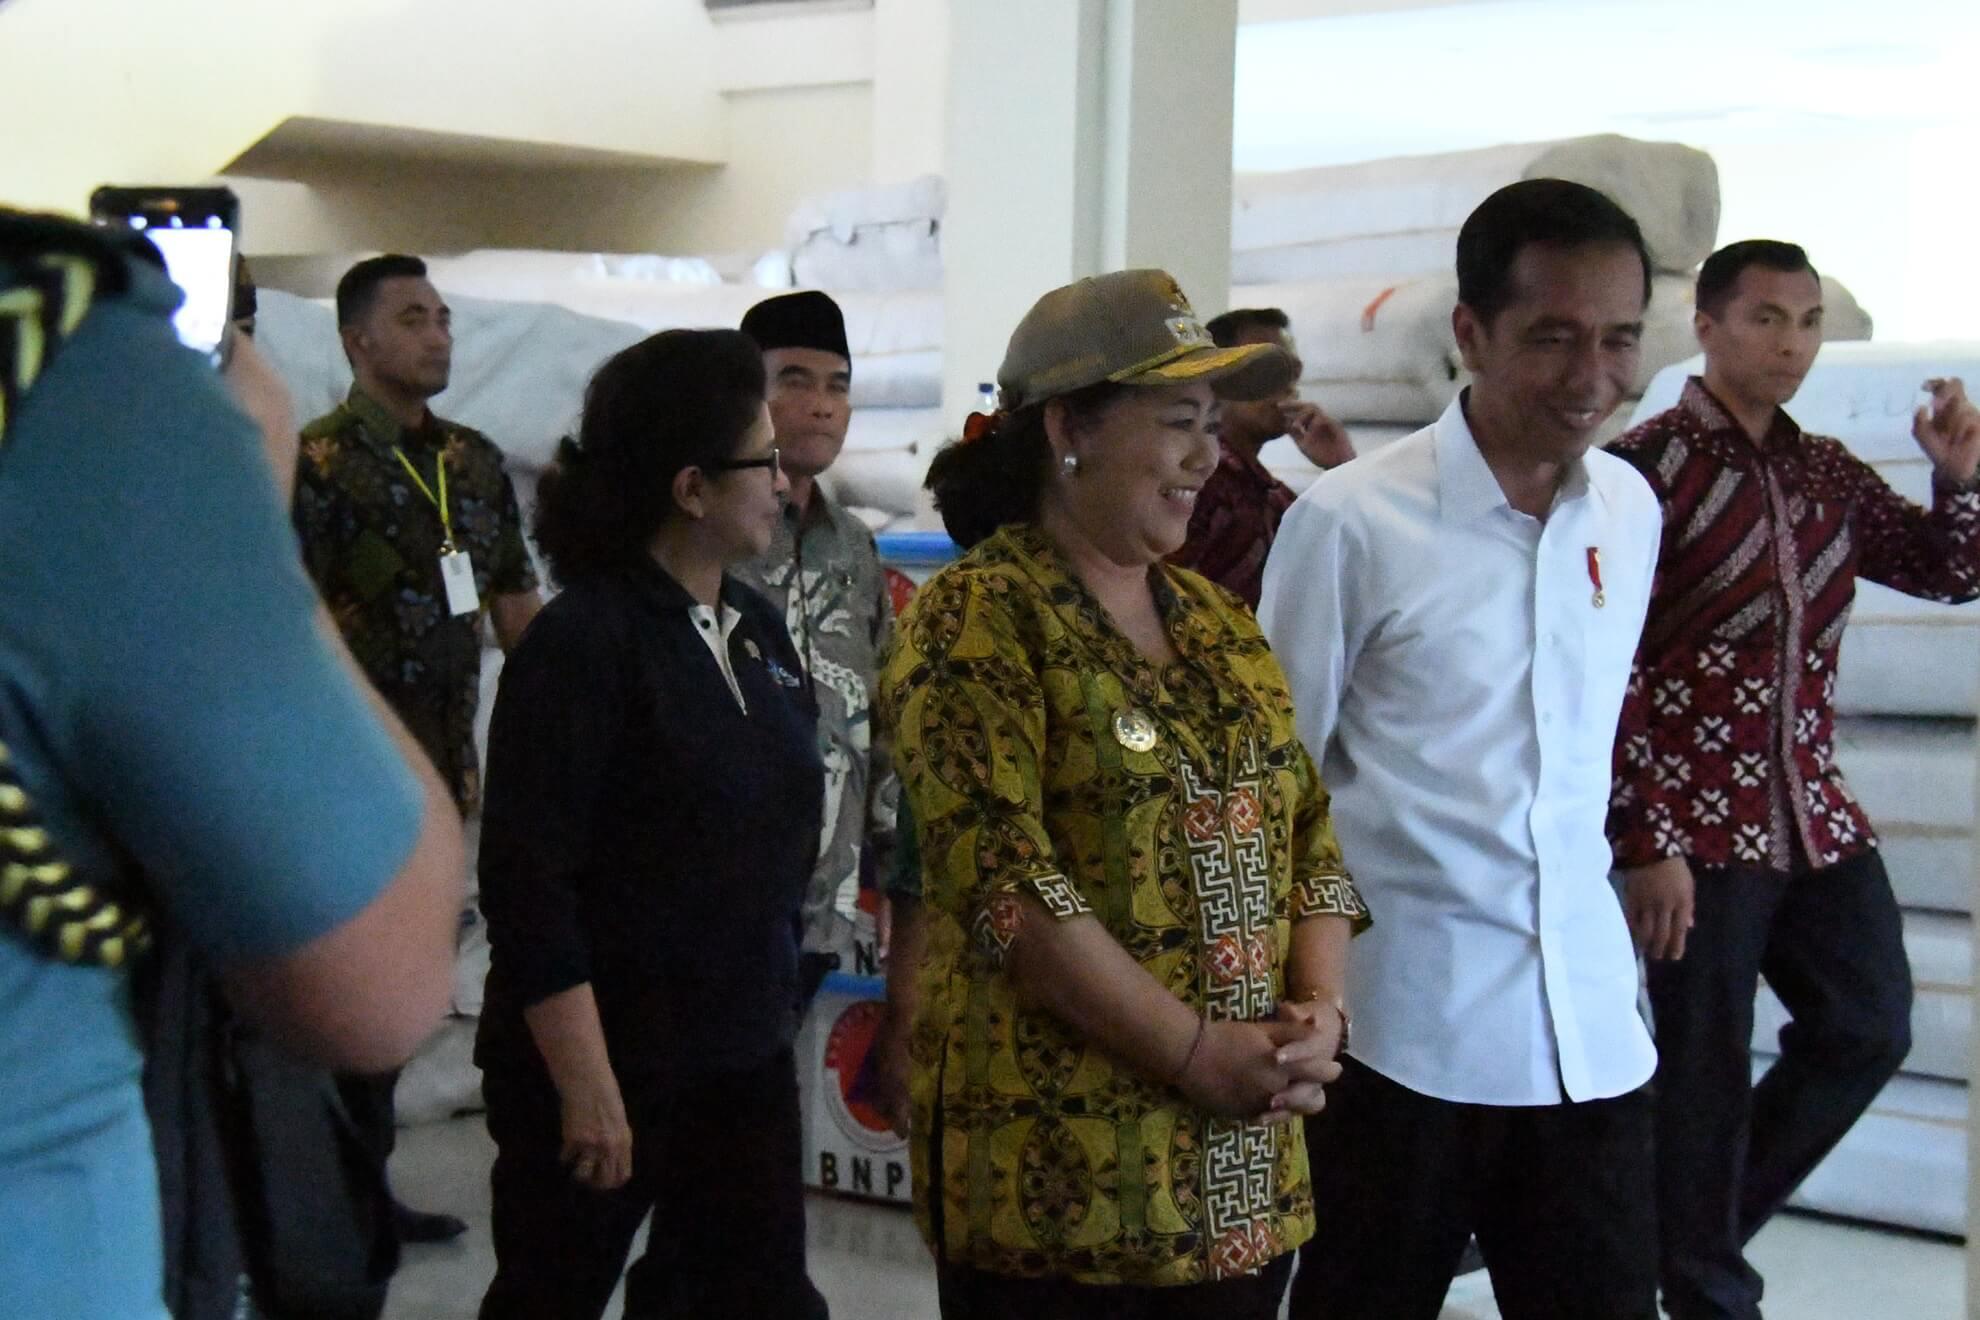 presiden-jokowi-dan-kabinet-kerja-meninjau-kesiapan-logistik-di-pos-komando-bencana-gunung-agung-desa-karangasem-jpg-5